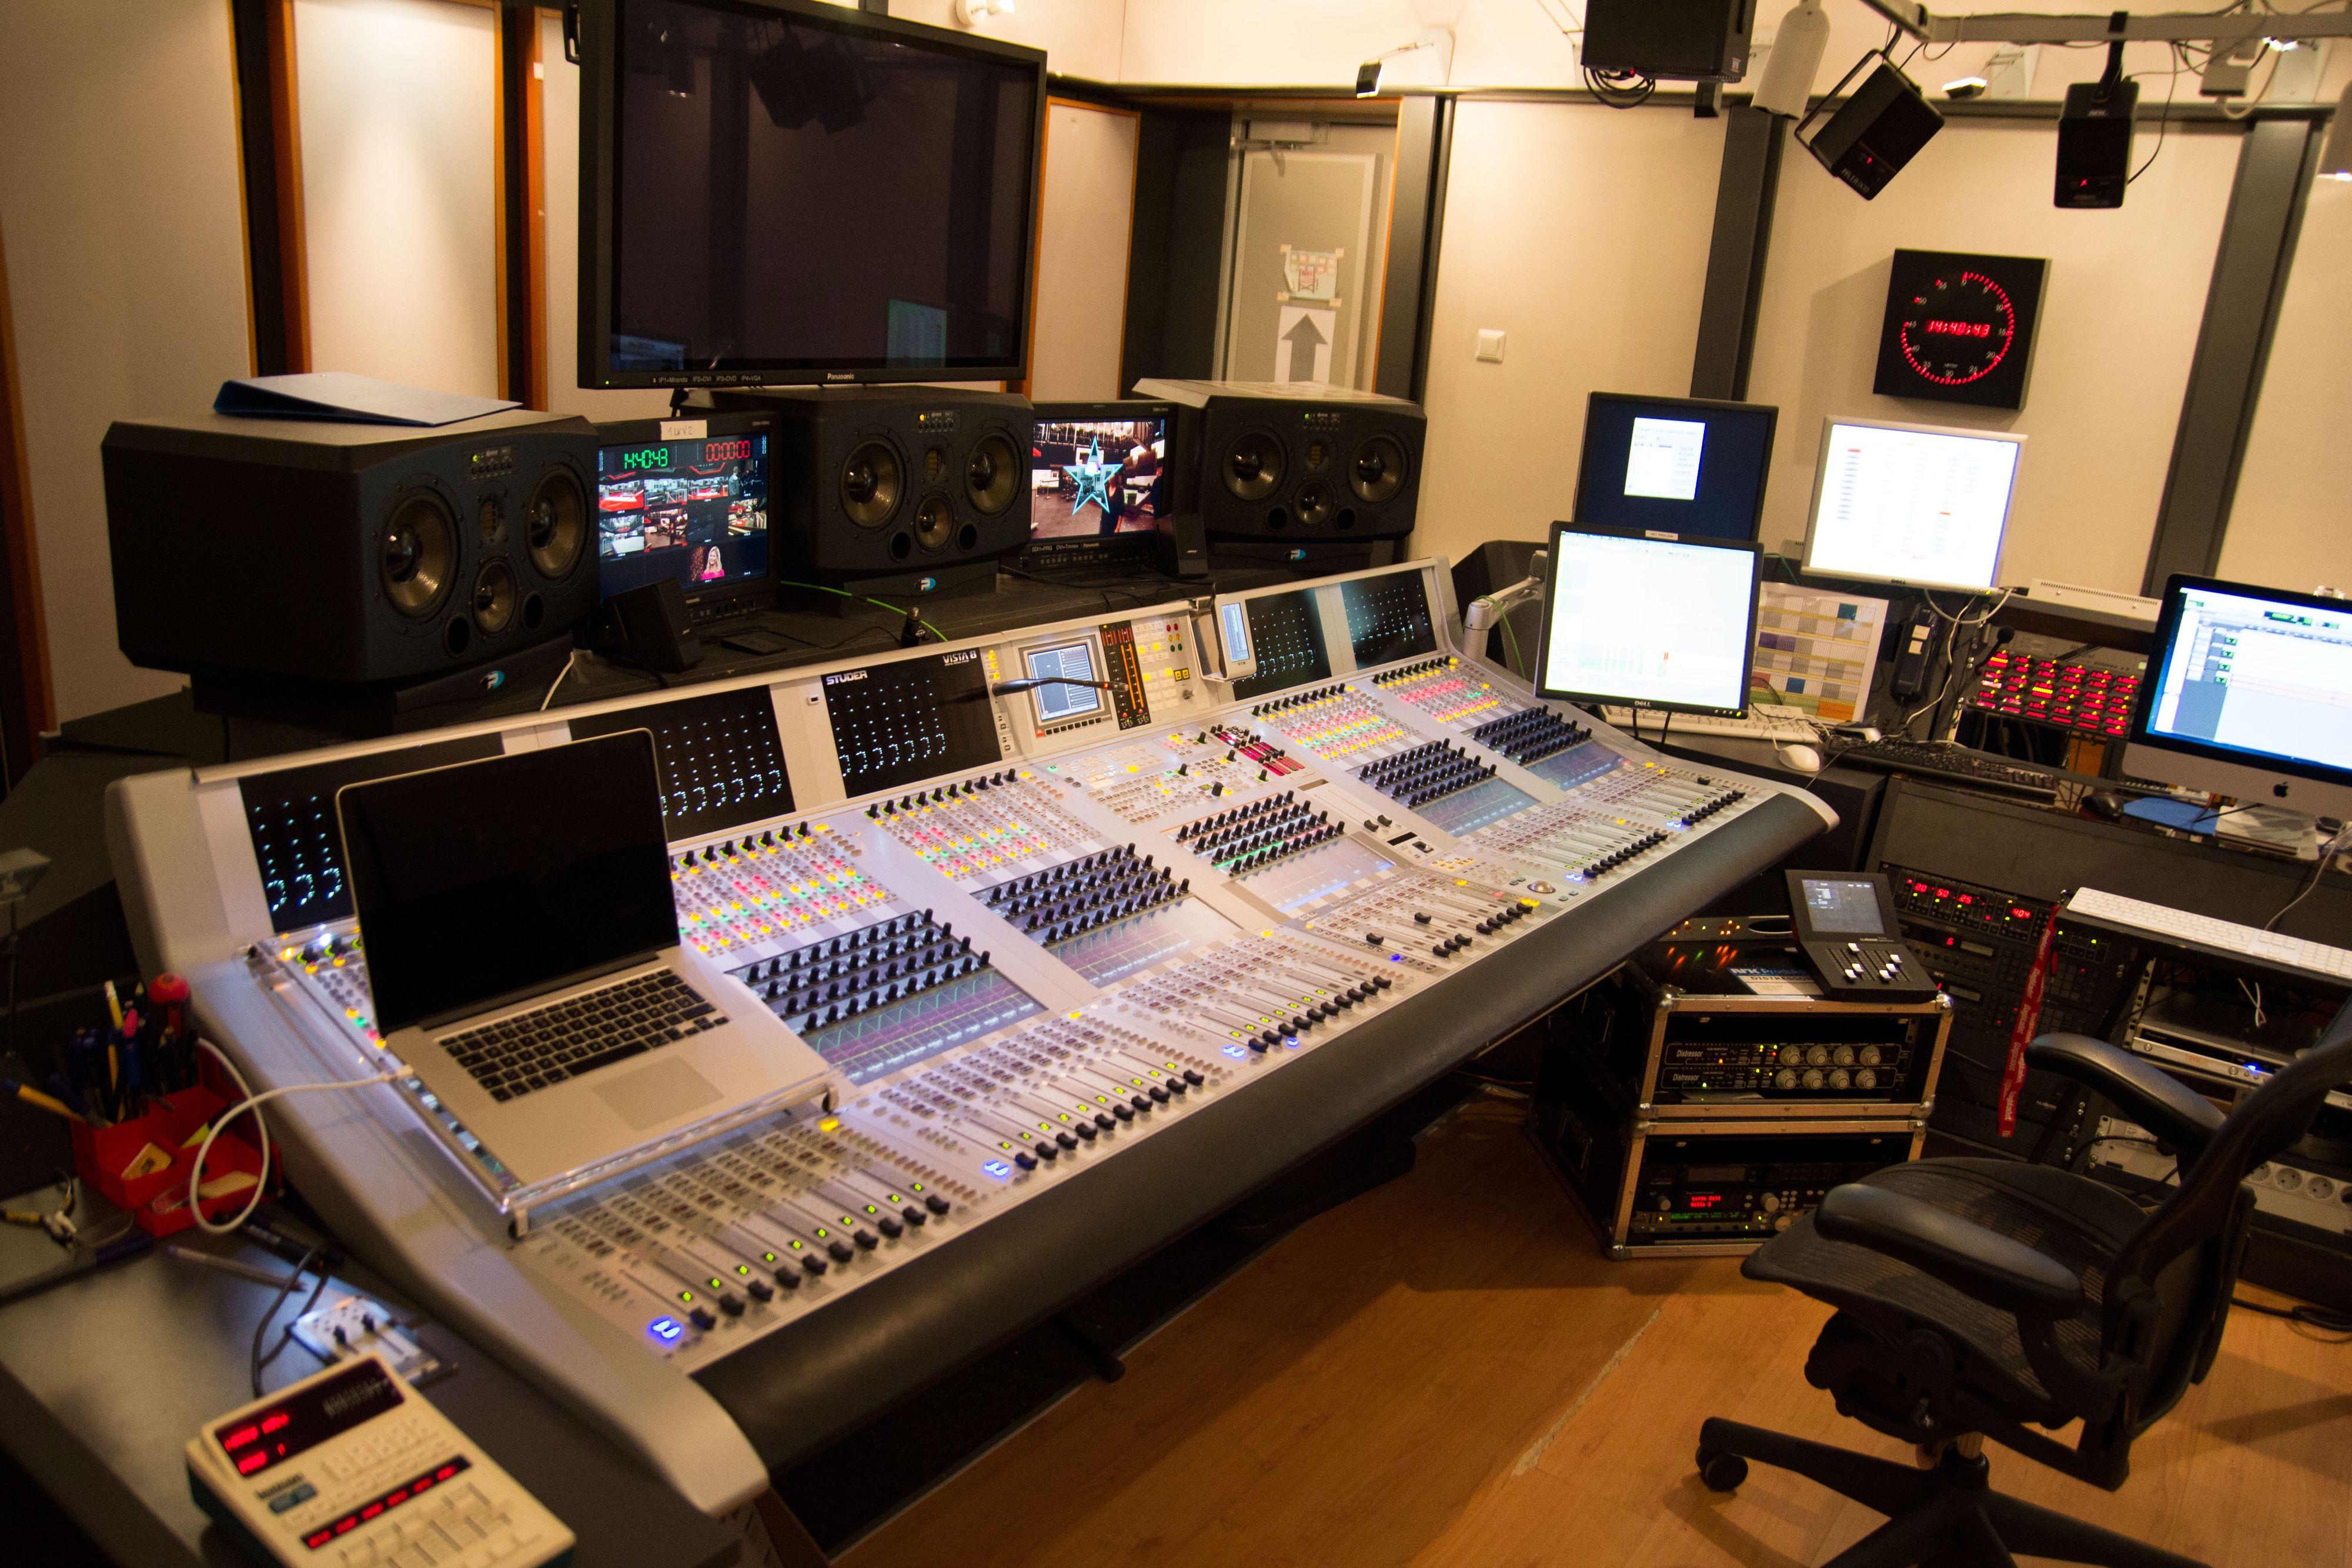 Her er lydkontrollen til studioet vi besøkte.Foto: Ole Henrik Johansen / Hardware.no